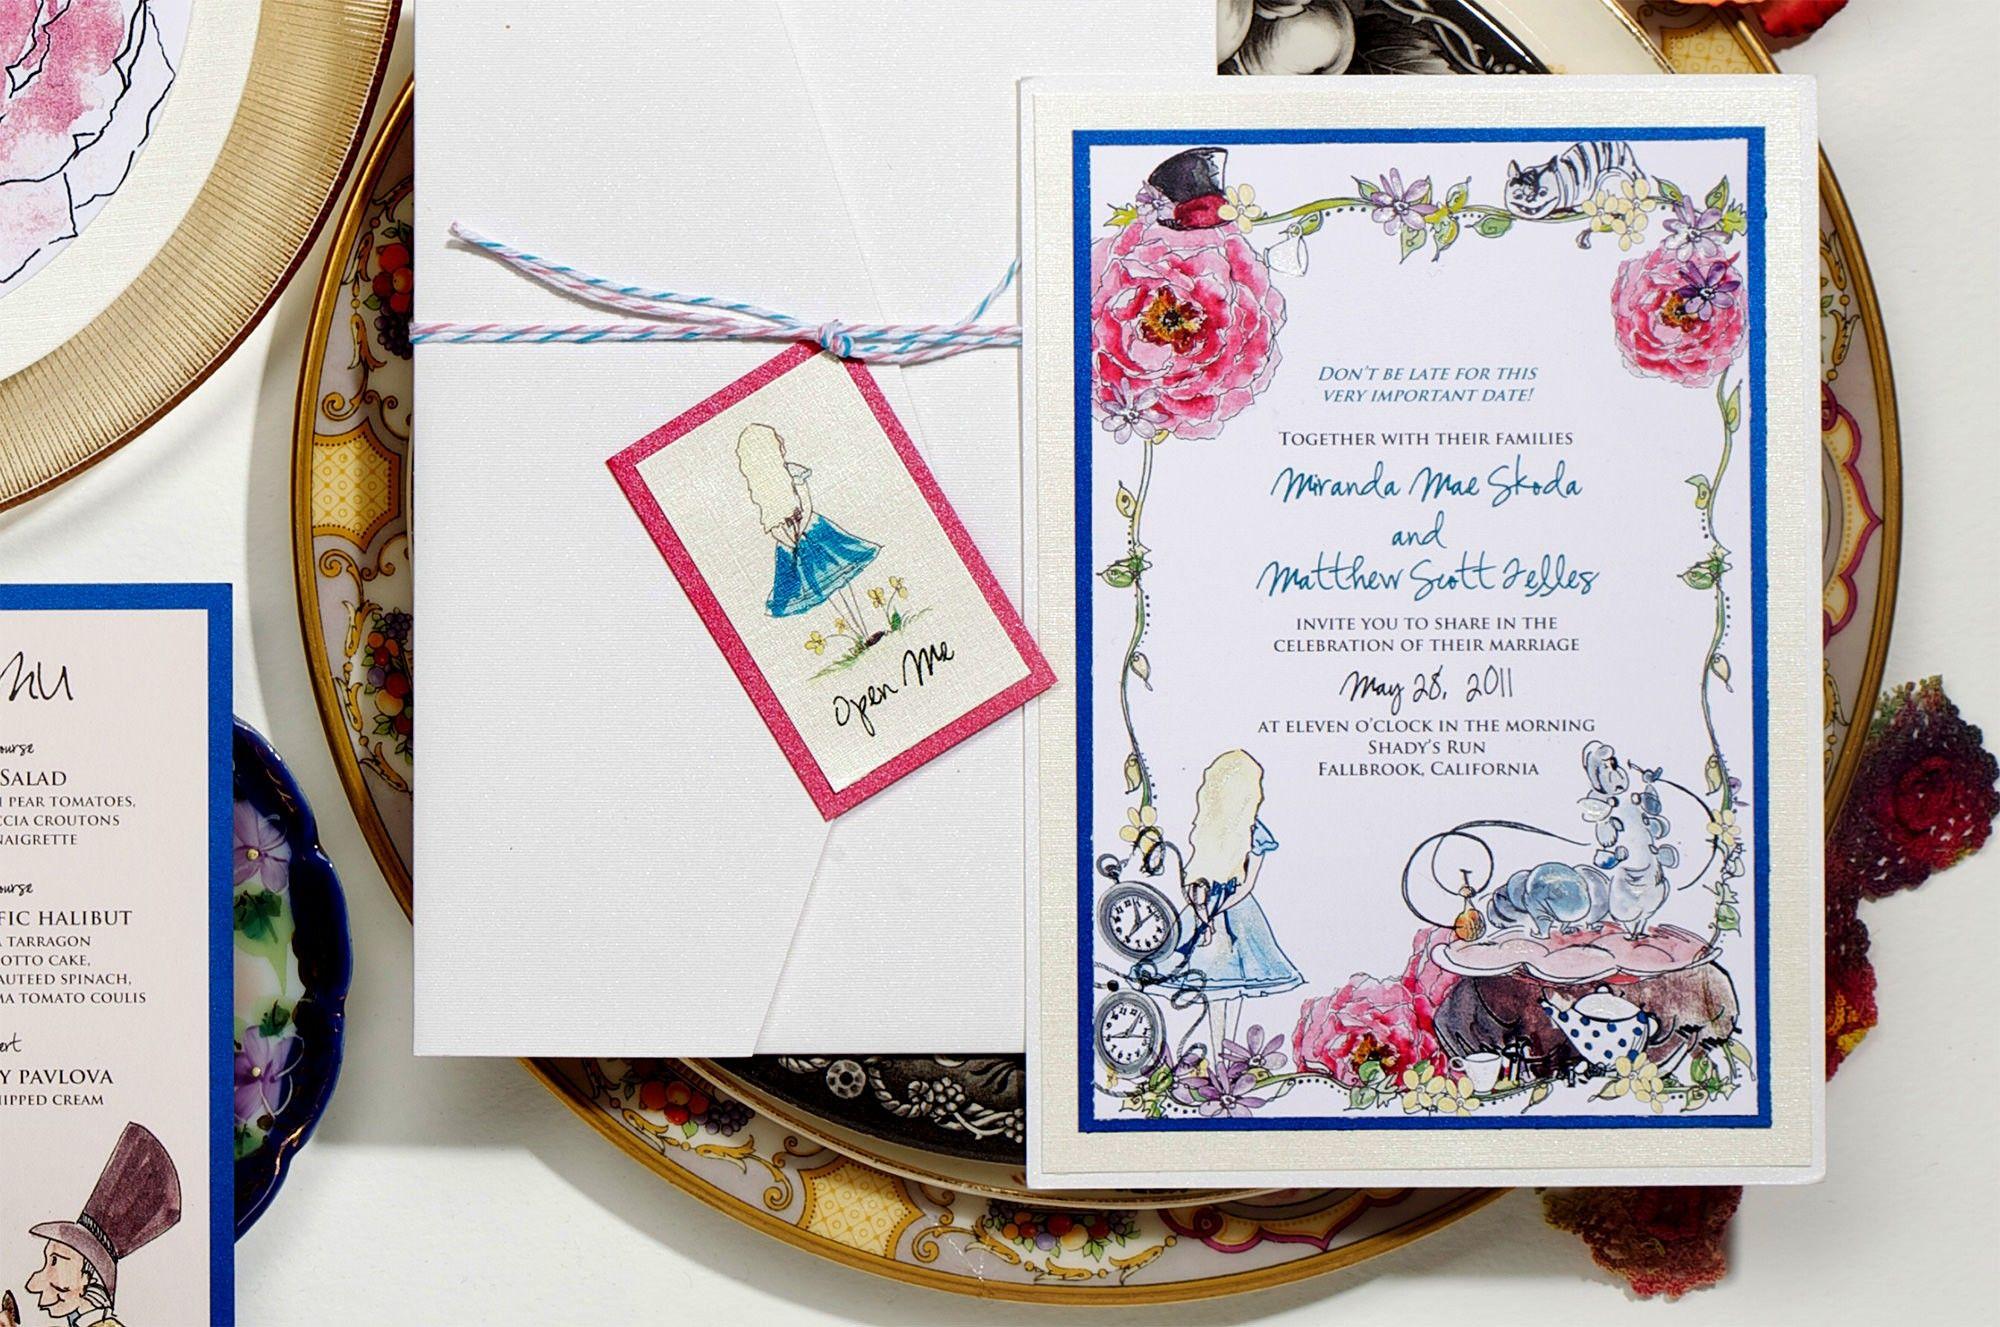 next day wedding invitations%0A Alice in Wonderland Wedding Invitations